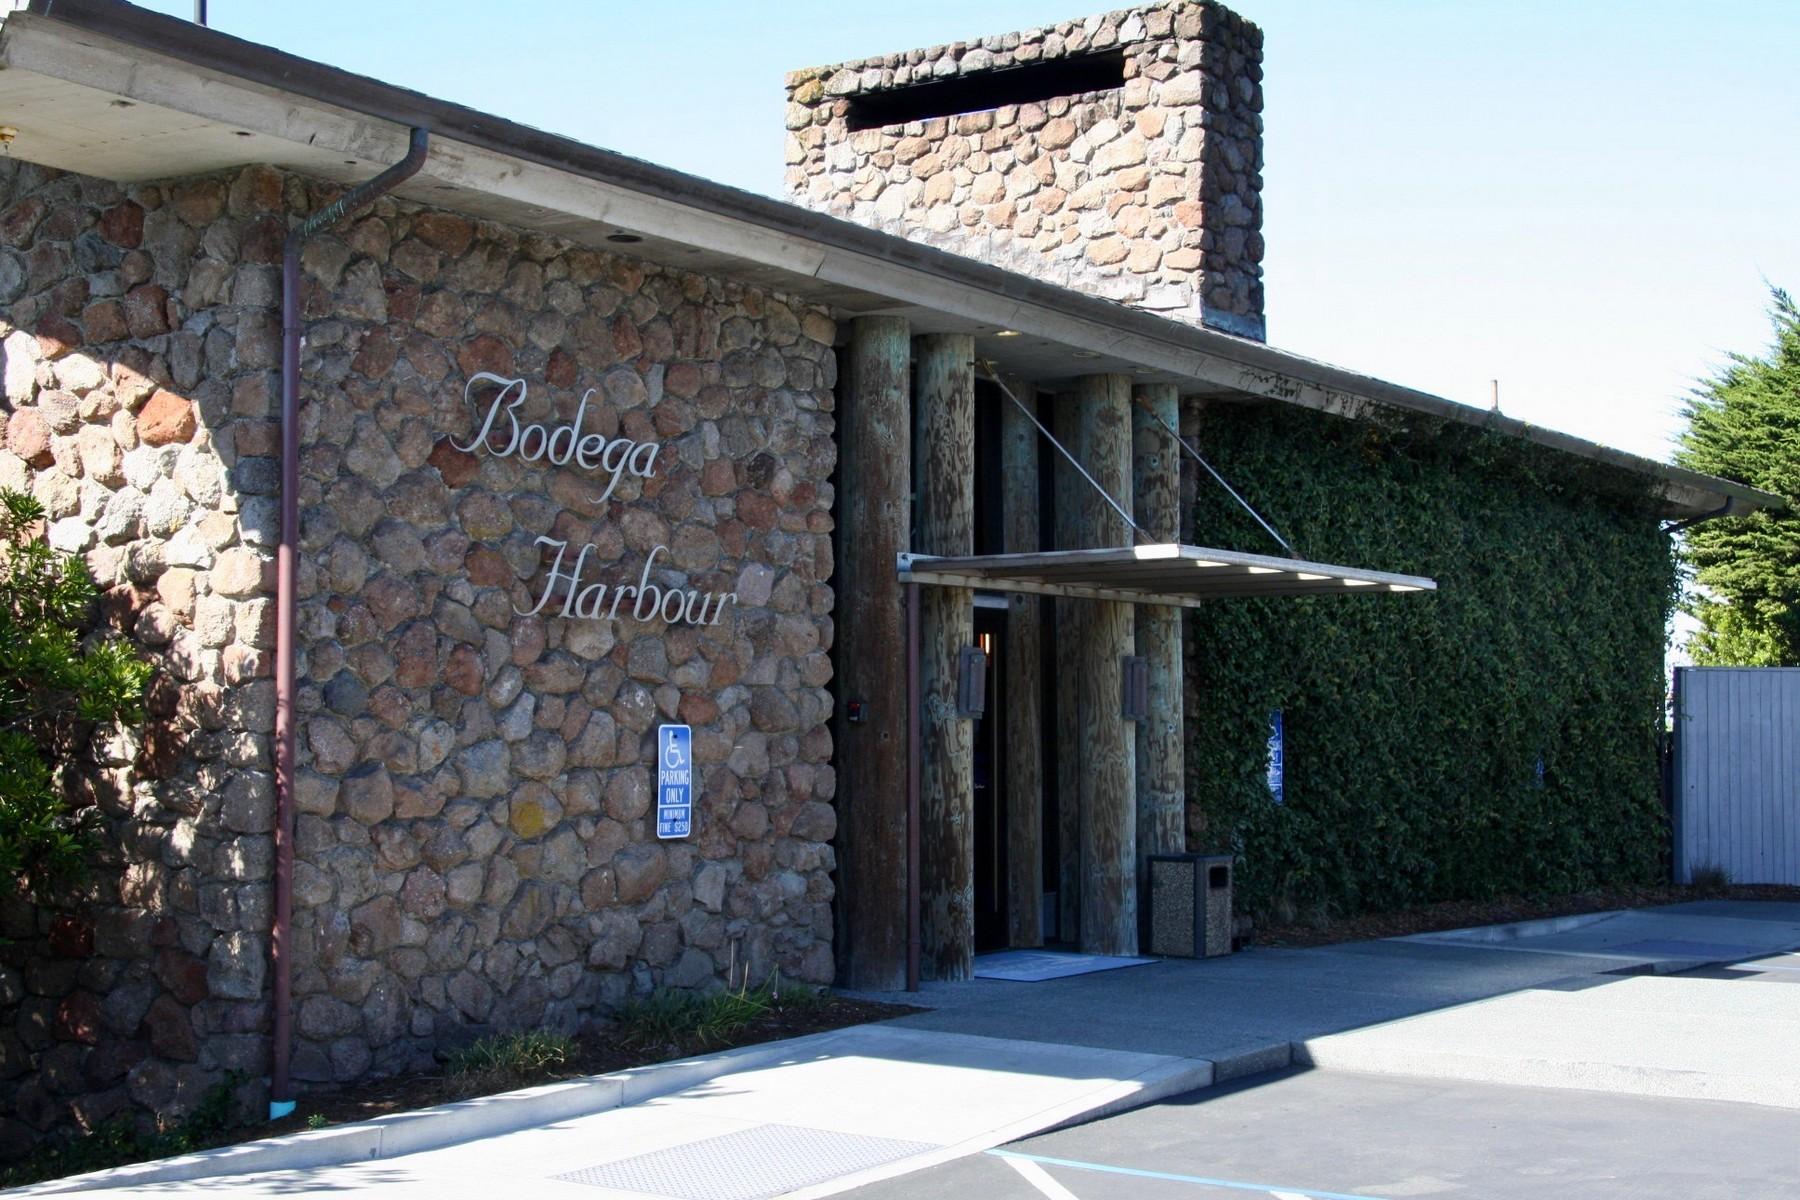 Additional photo for property listing at 88 Cypress Loop 88 Cypress Loop 博迪加贝, 加利福尼亚州 94923 美国